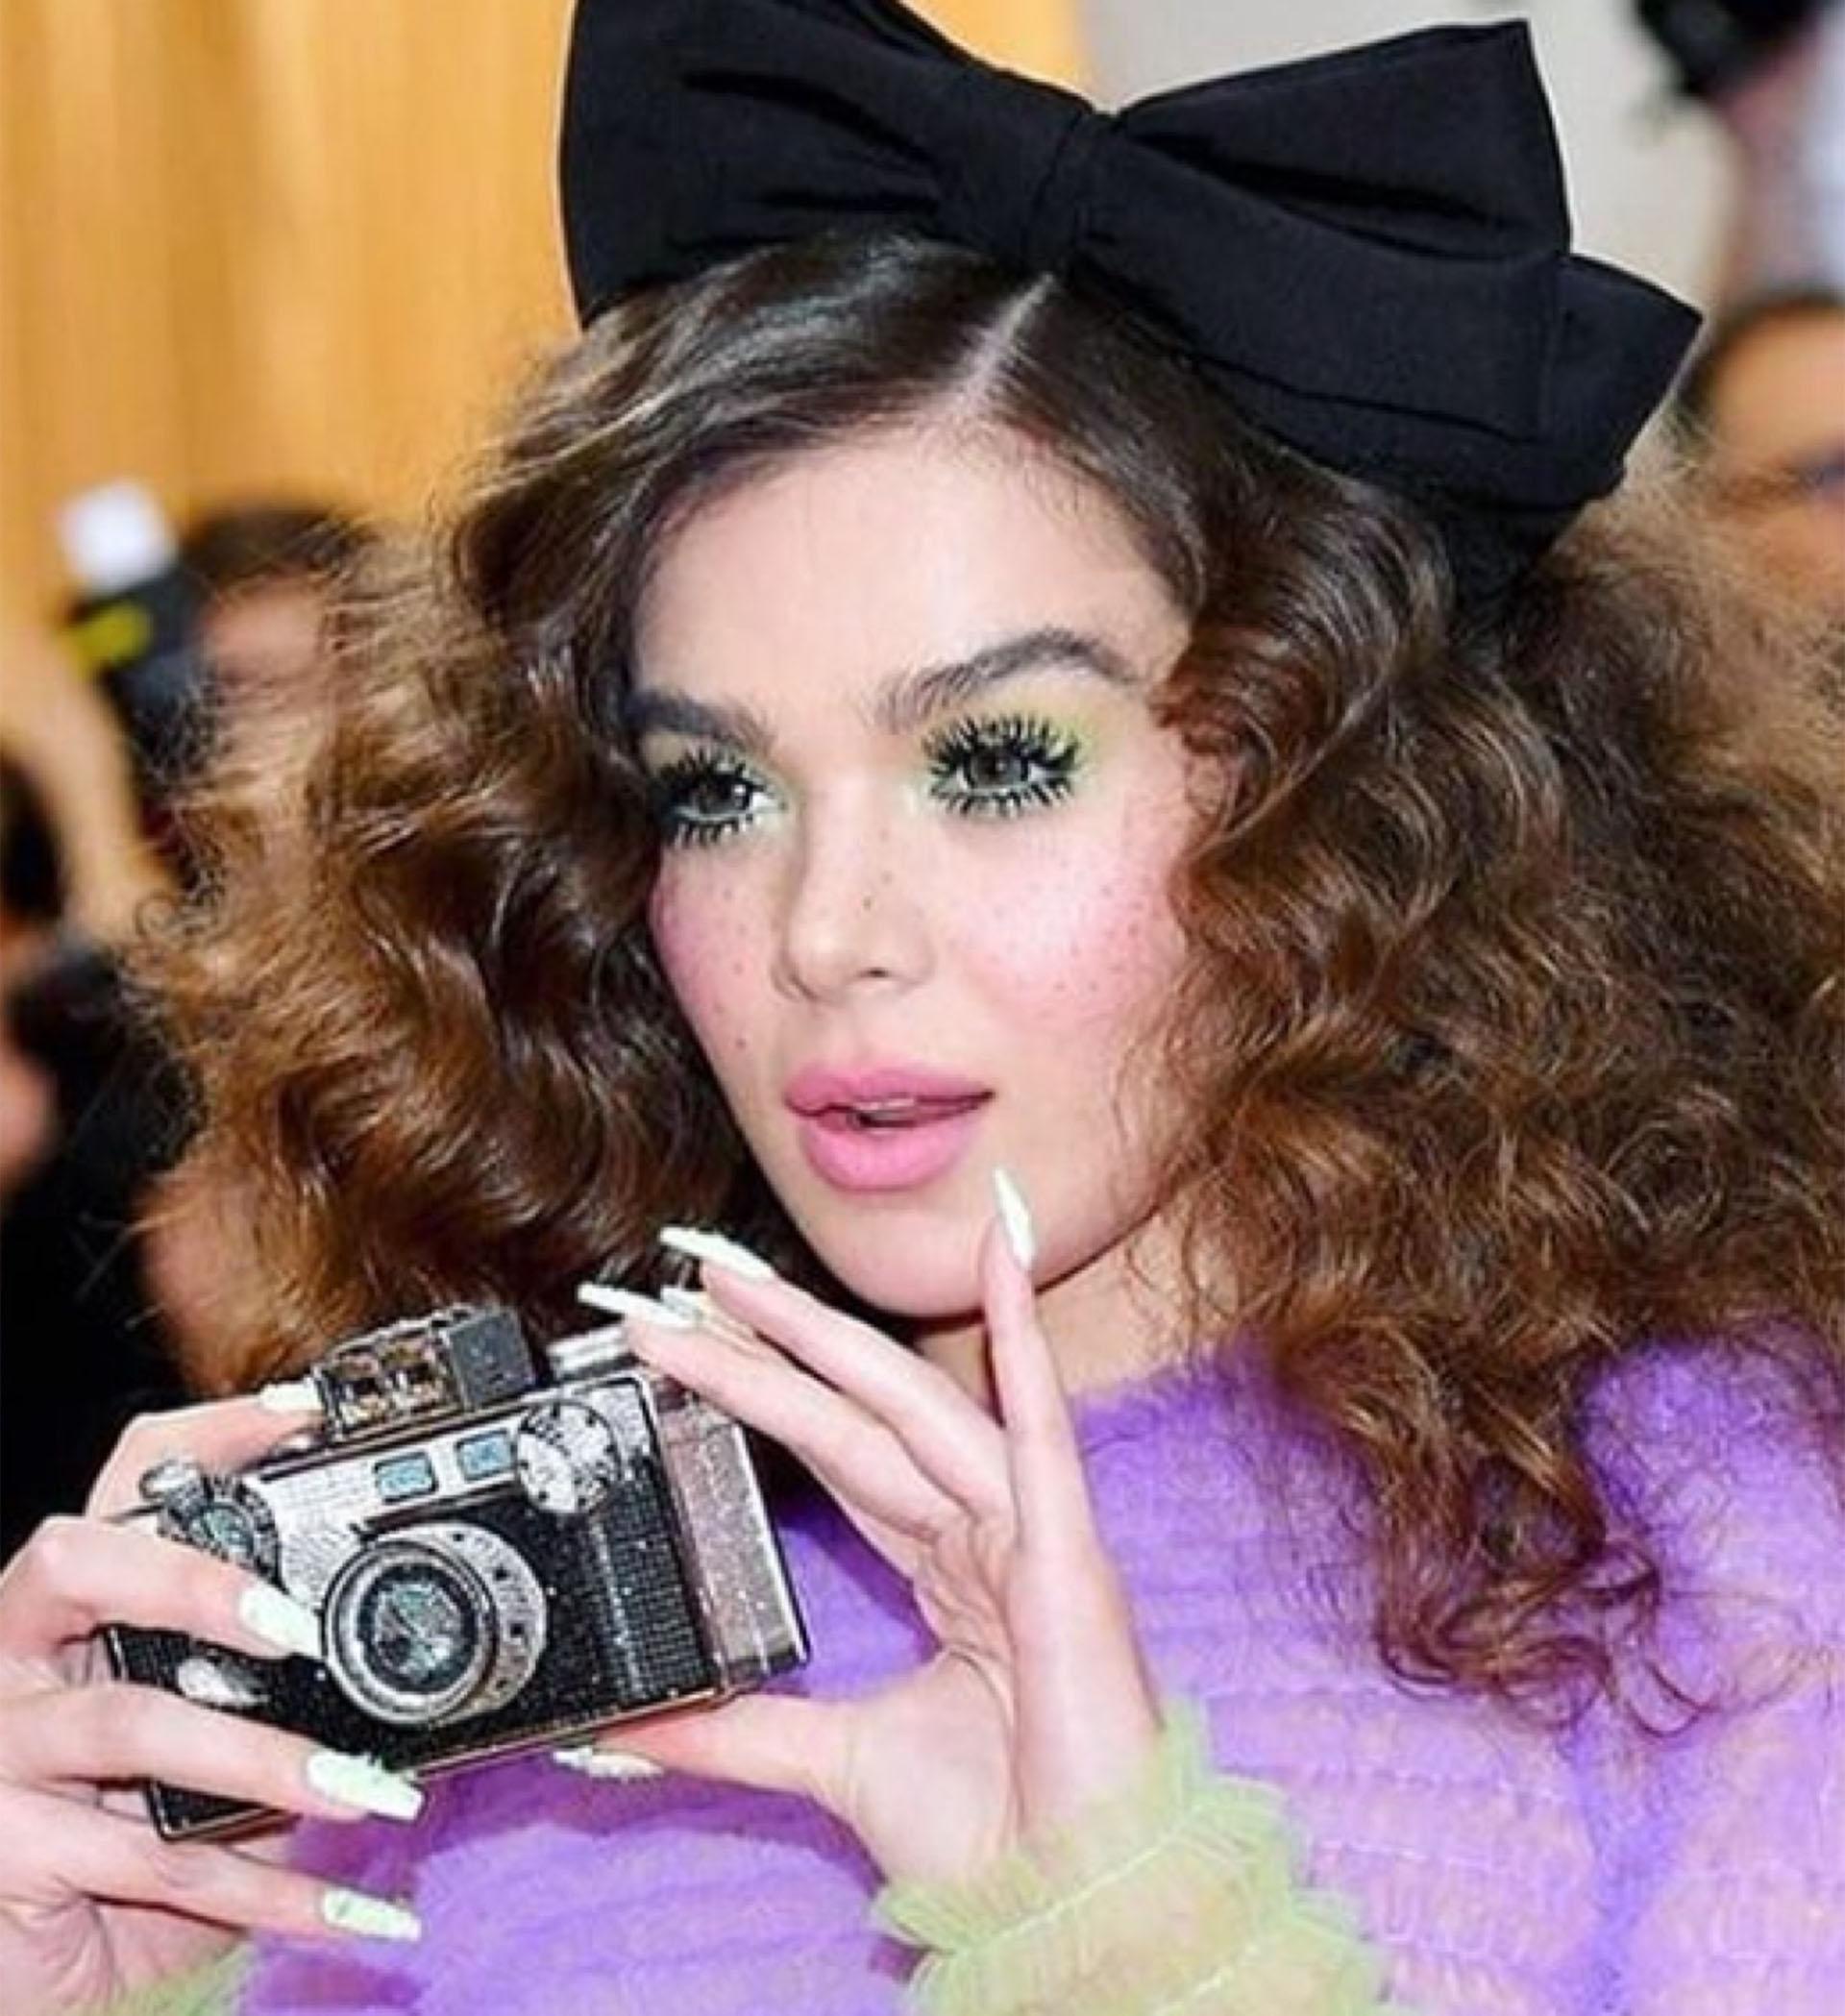 #PARA TI - GALA MET 2019 BEAUTY LOOKS - Belleza - 12